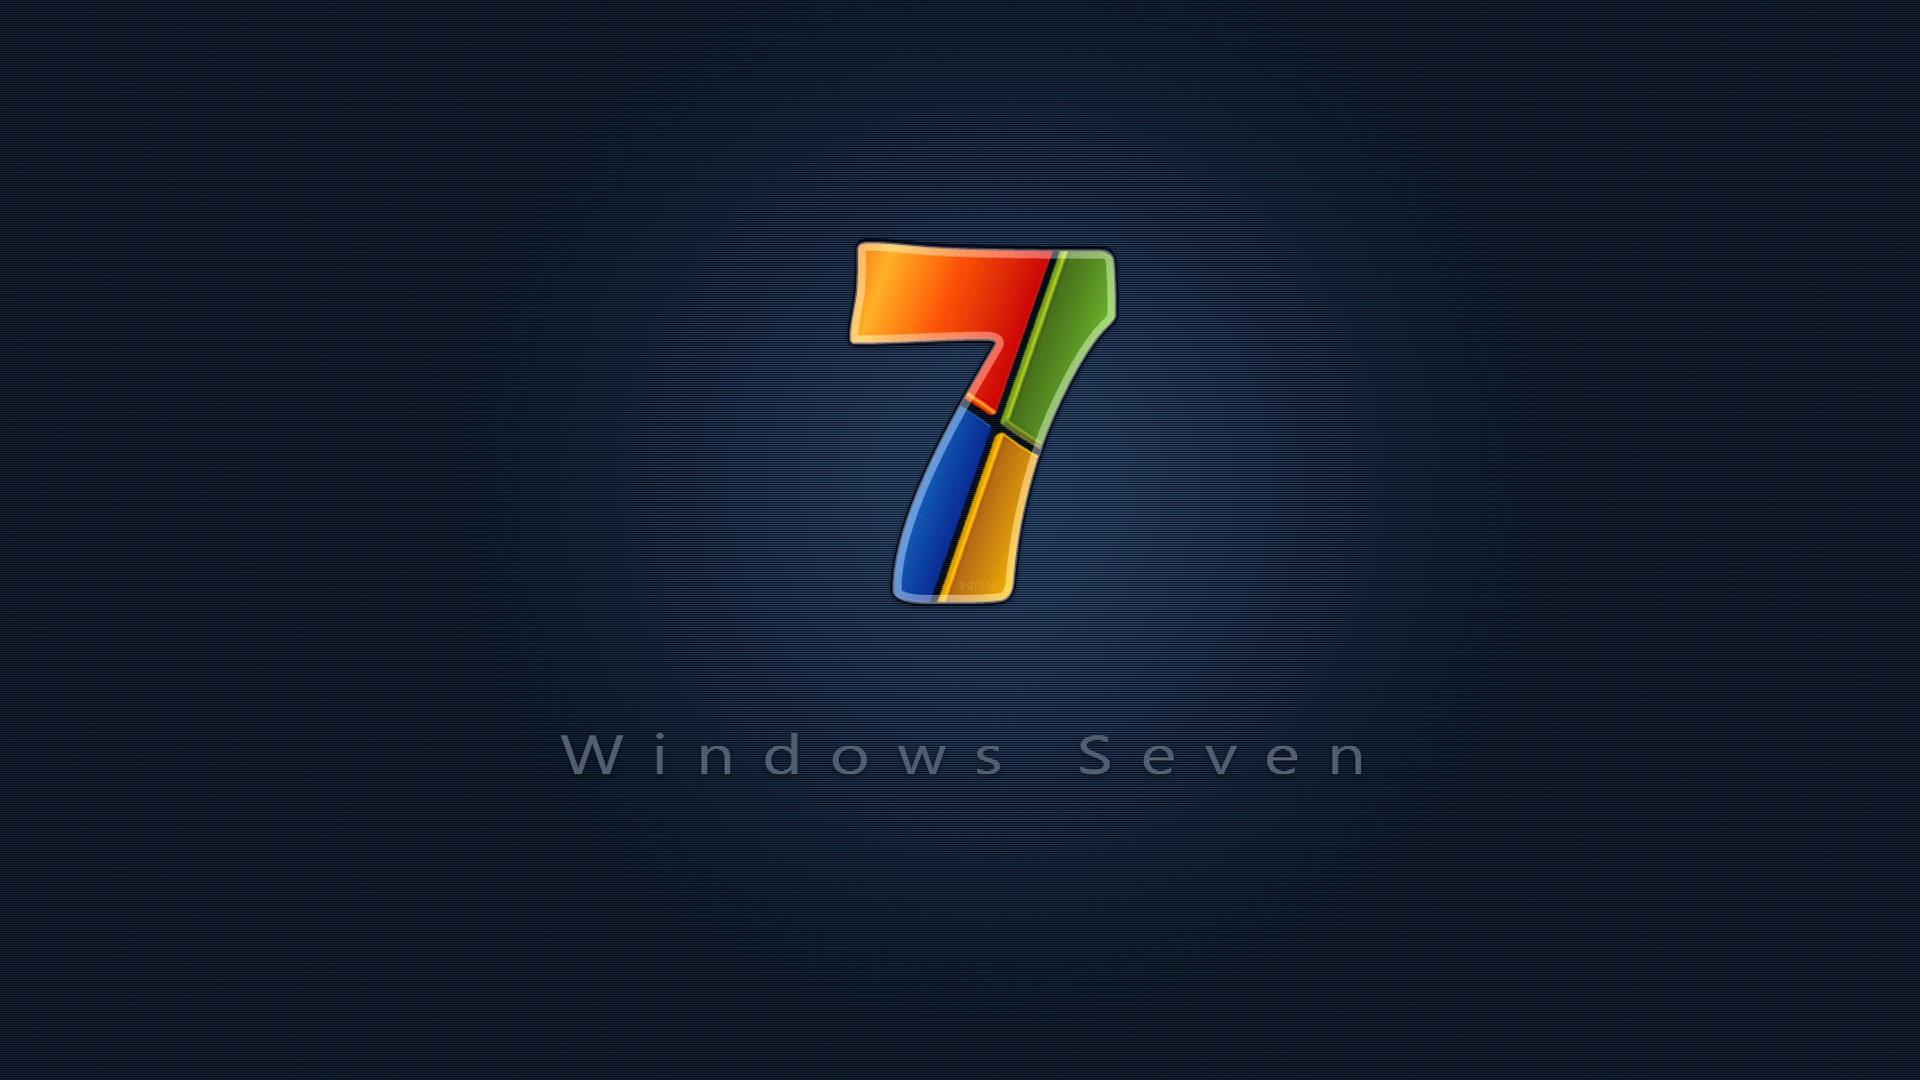 Download Wallpaper 1920x1080 Windows 7 Red Blue Yellow Green